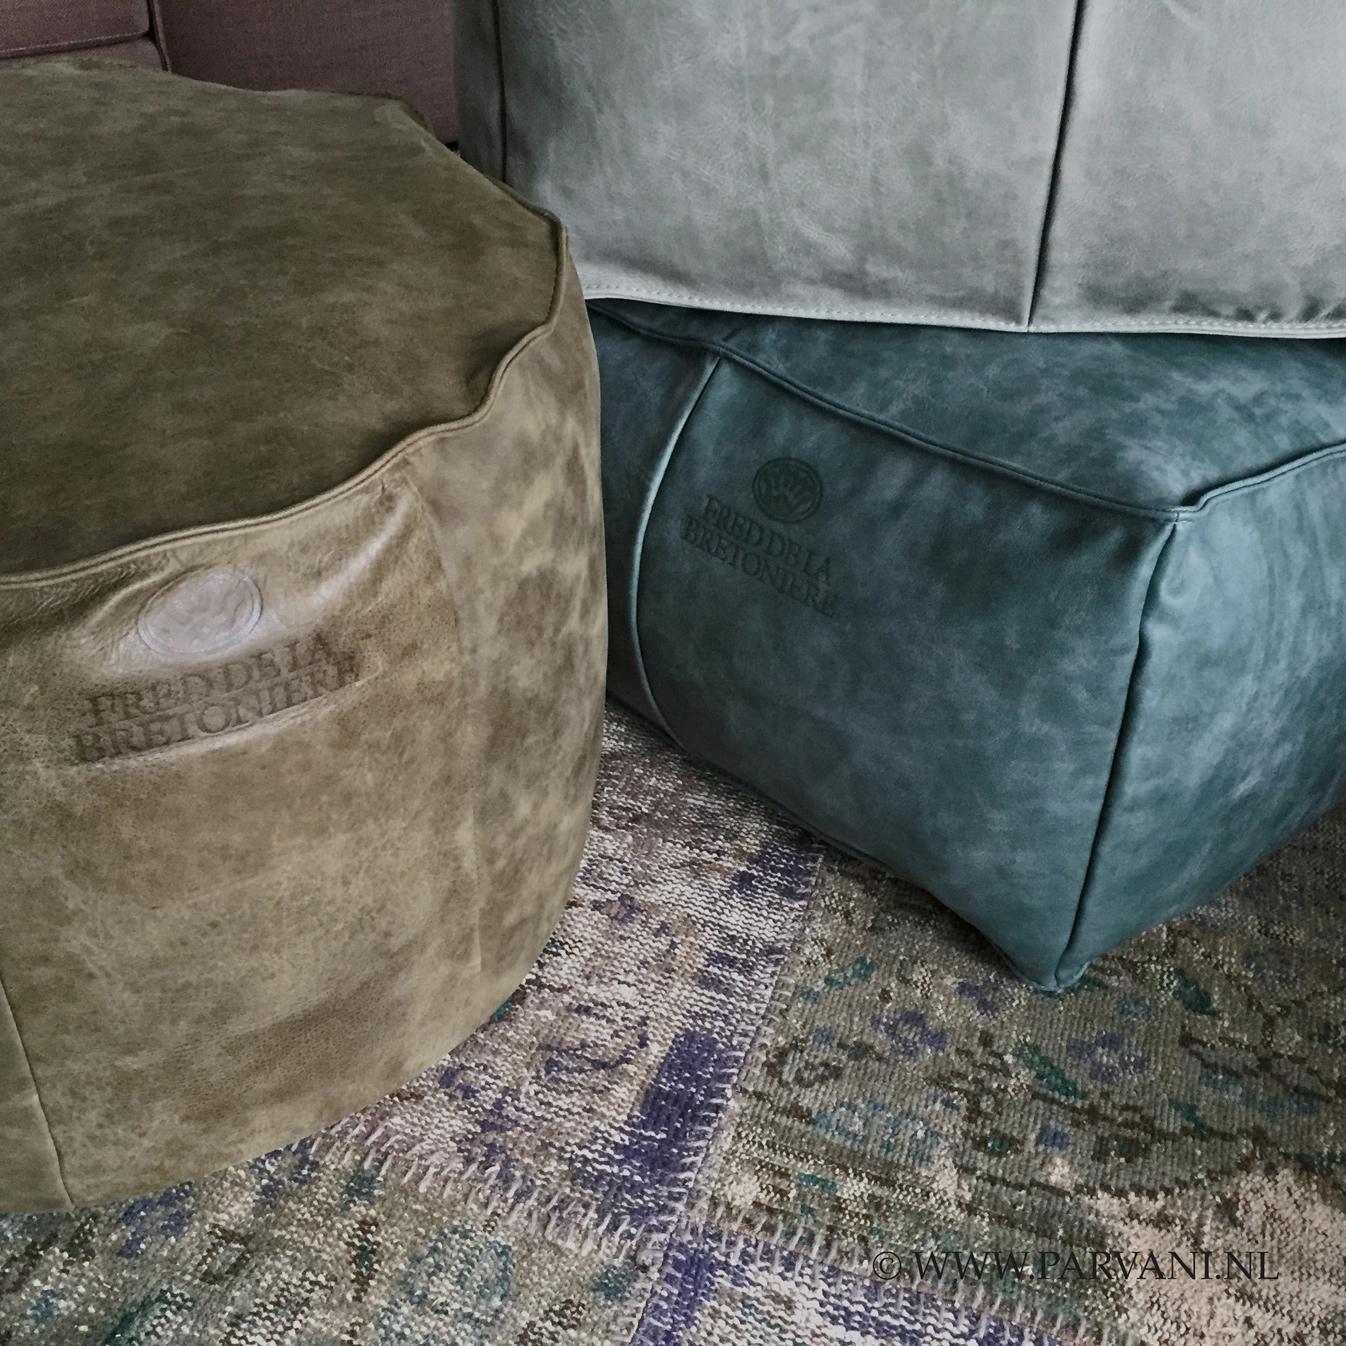 stoelen banken hoffz dmf fred de la bretoniere parvani. Black Bedroom Furniture Sets. Home Design Ideas